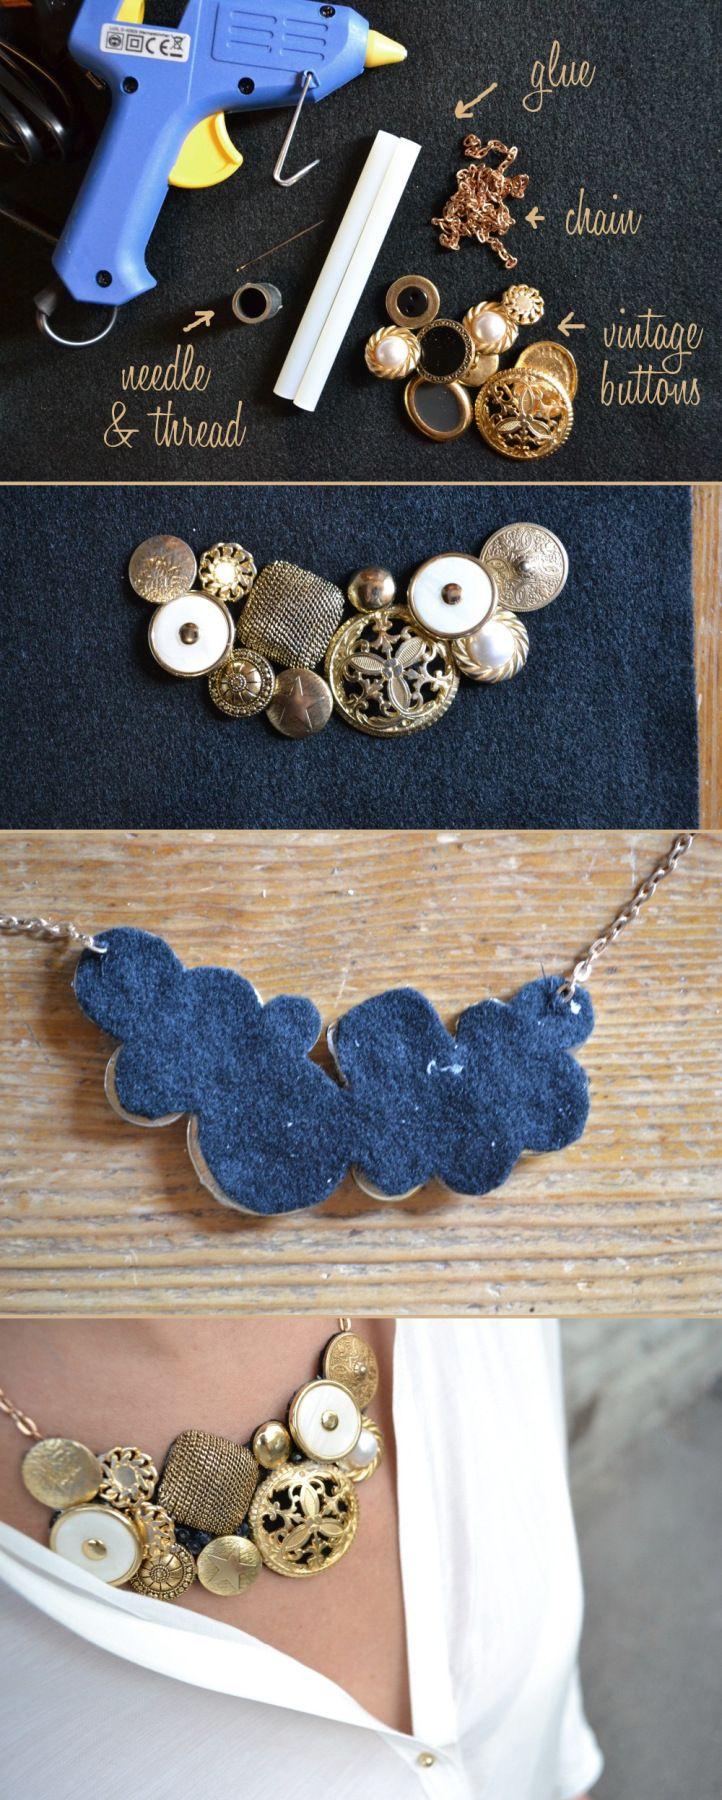 diy-vintage-buttons-necklace